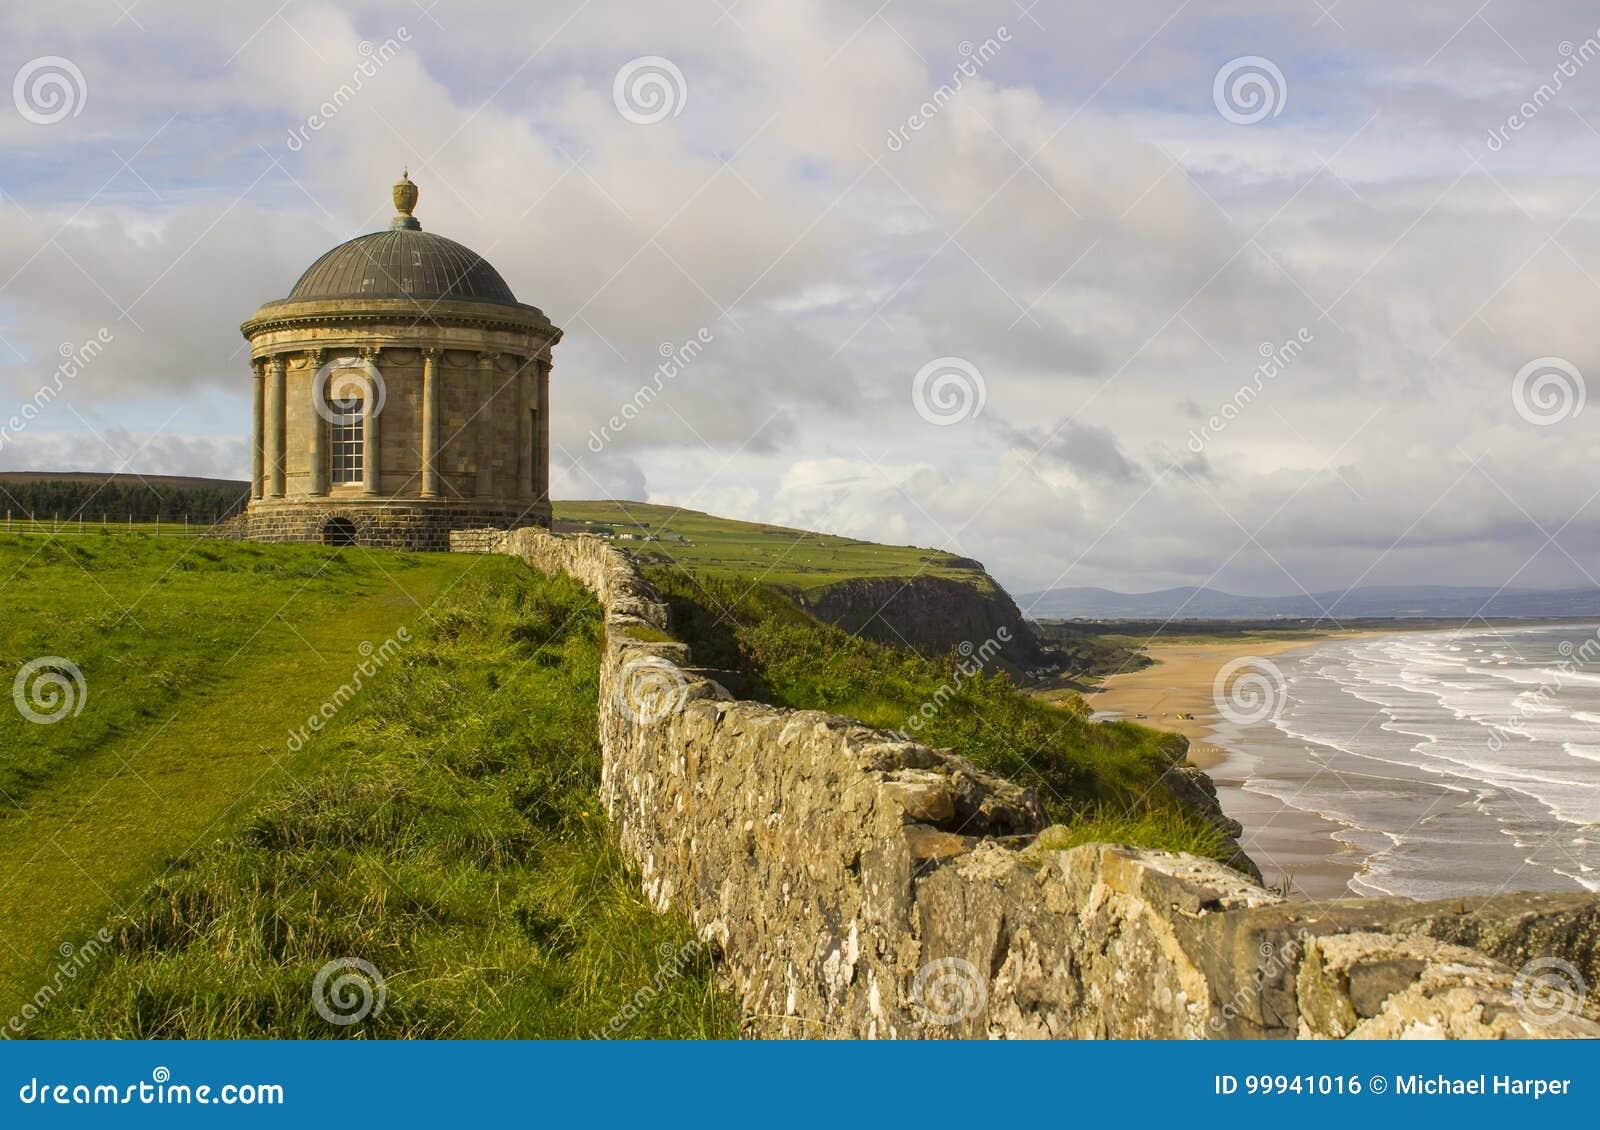 Mussendentempel op bergaf Demesne in Provincie Londonderry op de het Noordenkust wordt gevestigd van Ierland dat